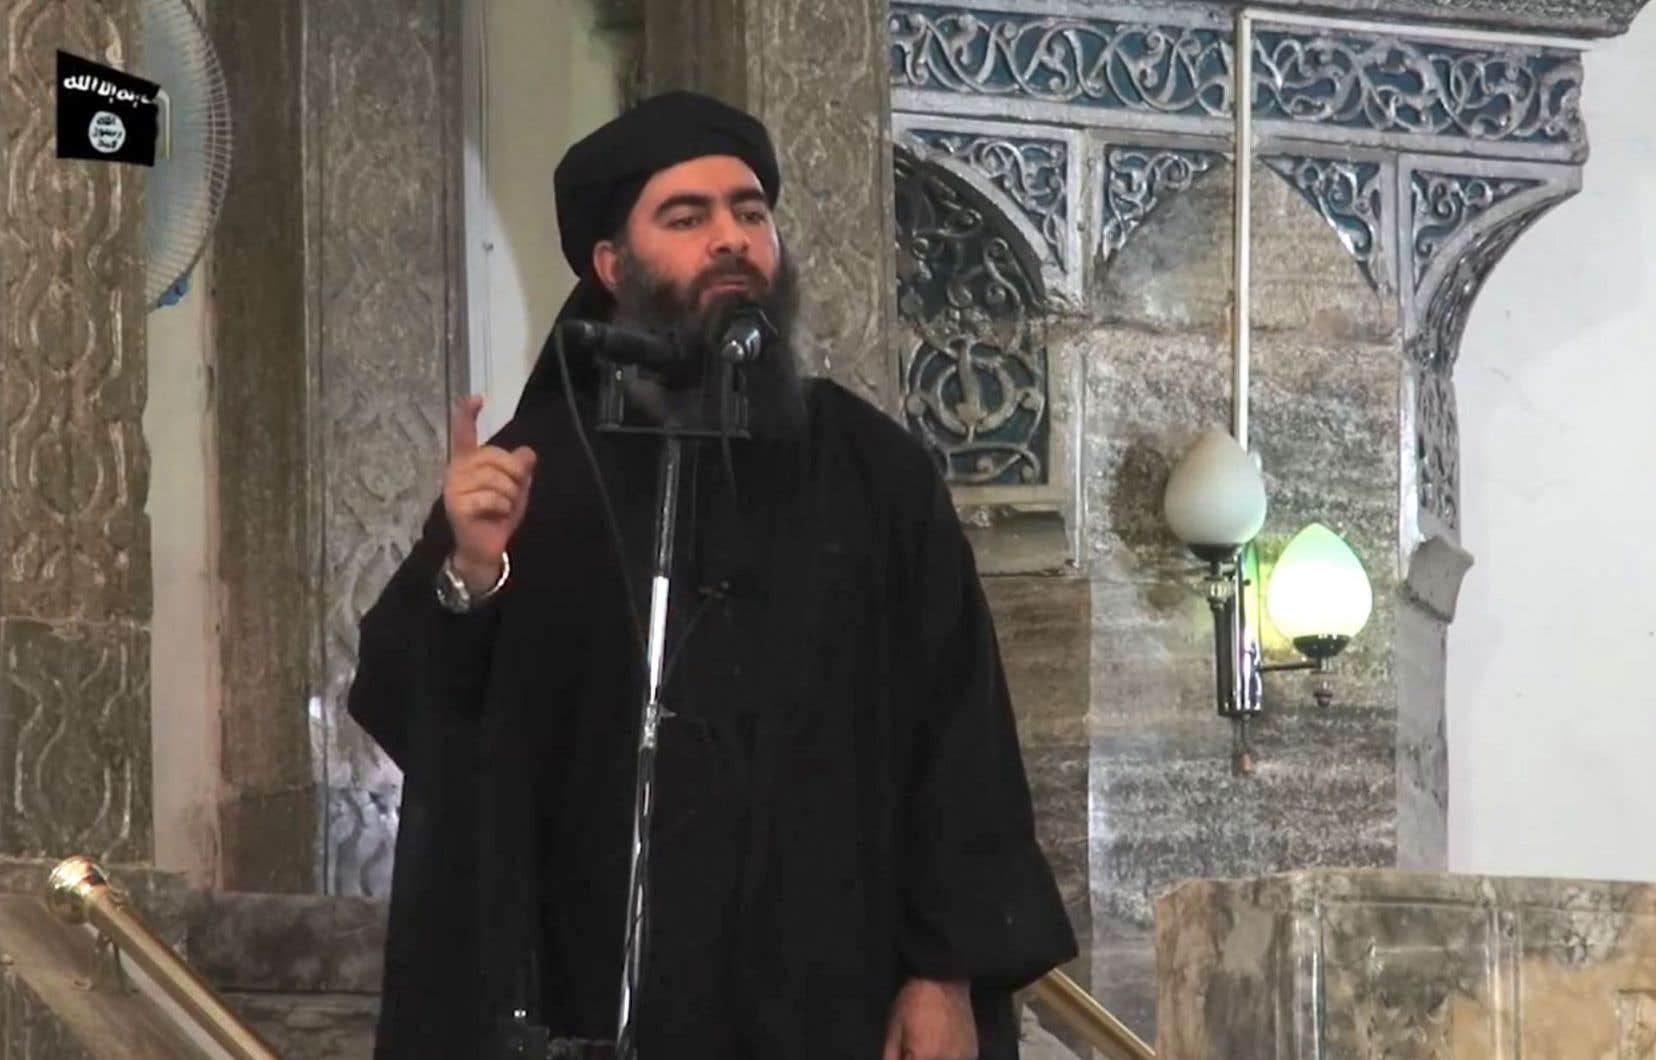 Capture d'écran d'une vidéo de propagande diffusée le 5juillet 2014 par al-Furqan Media montrant Abou Bakr al-Baghdadi à Mossoul